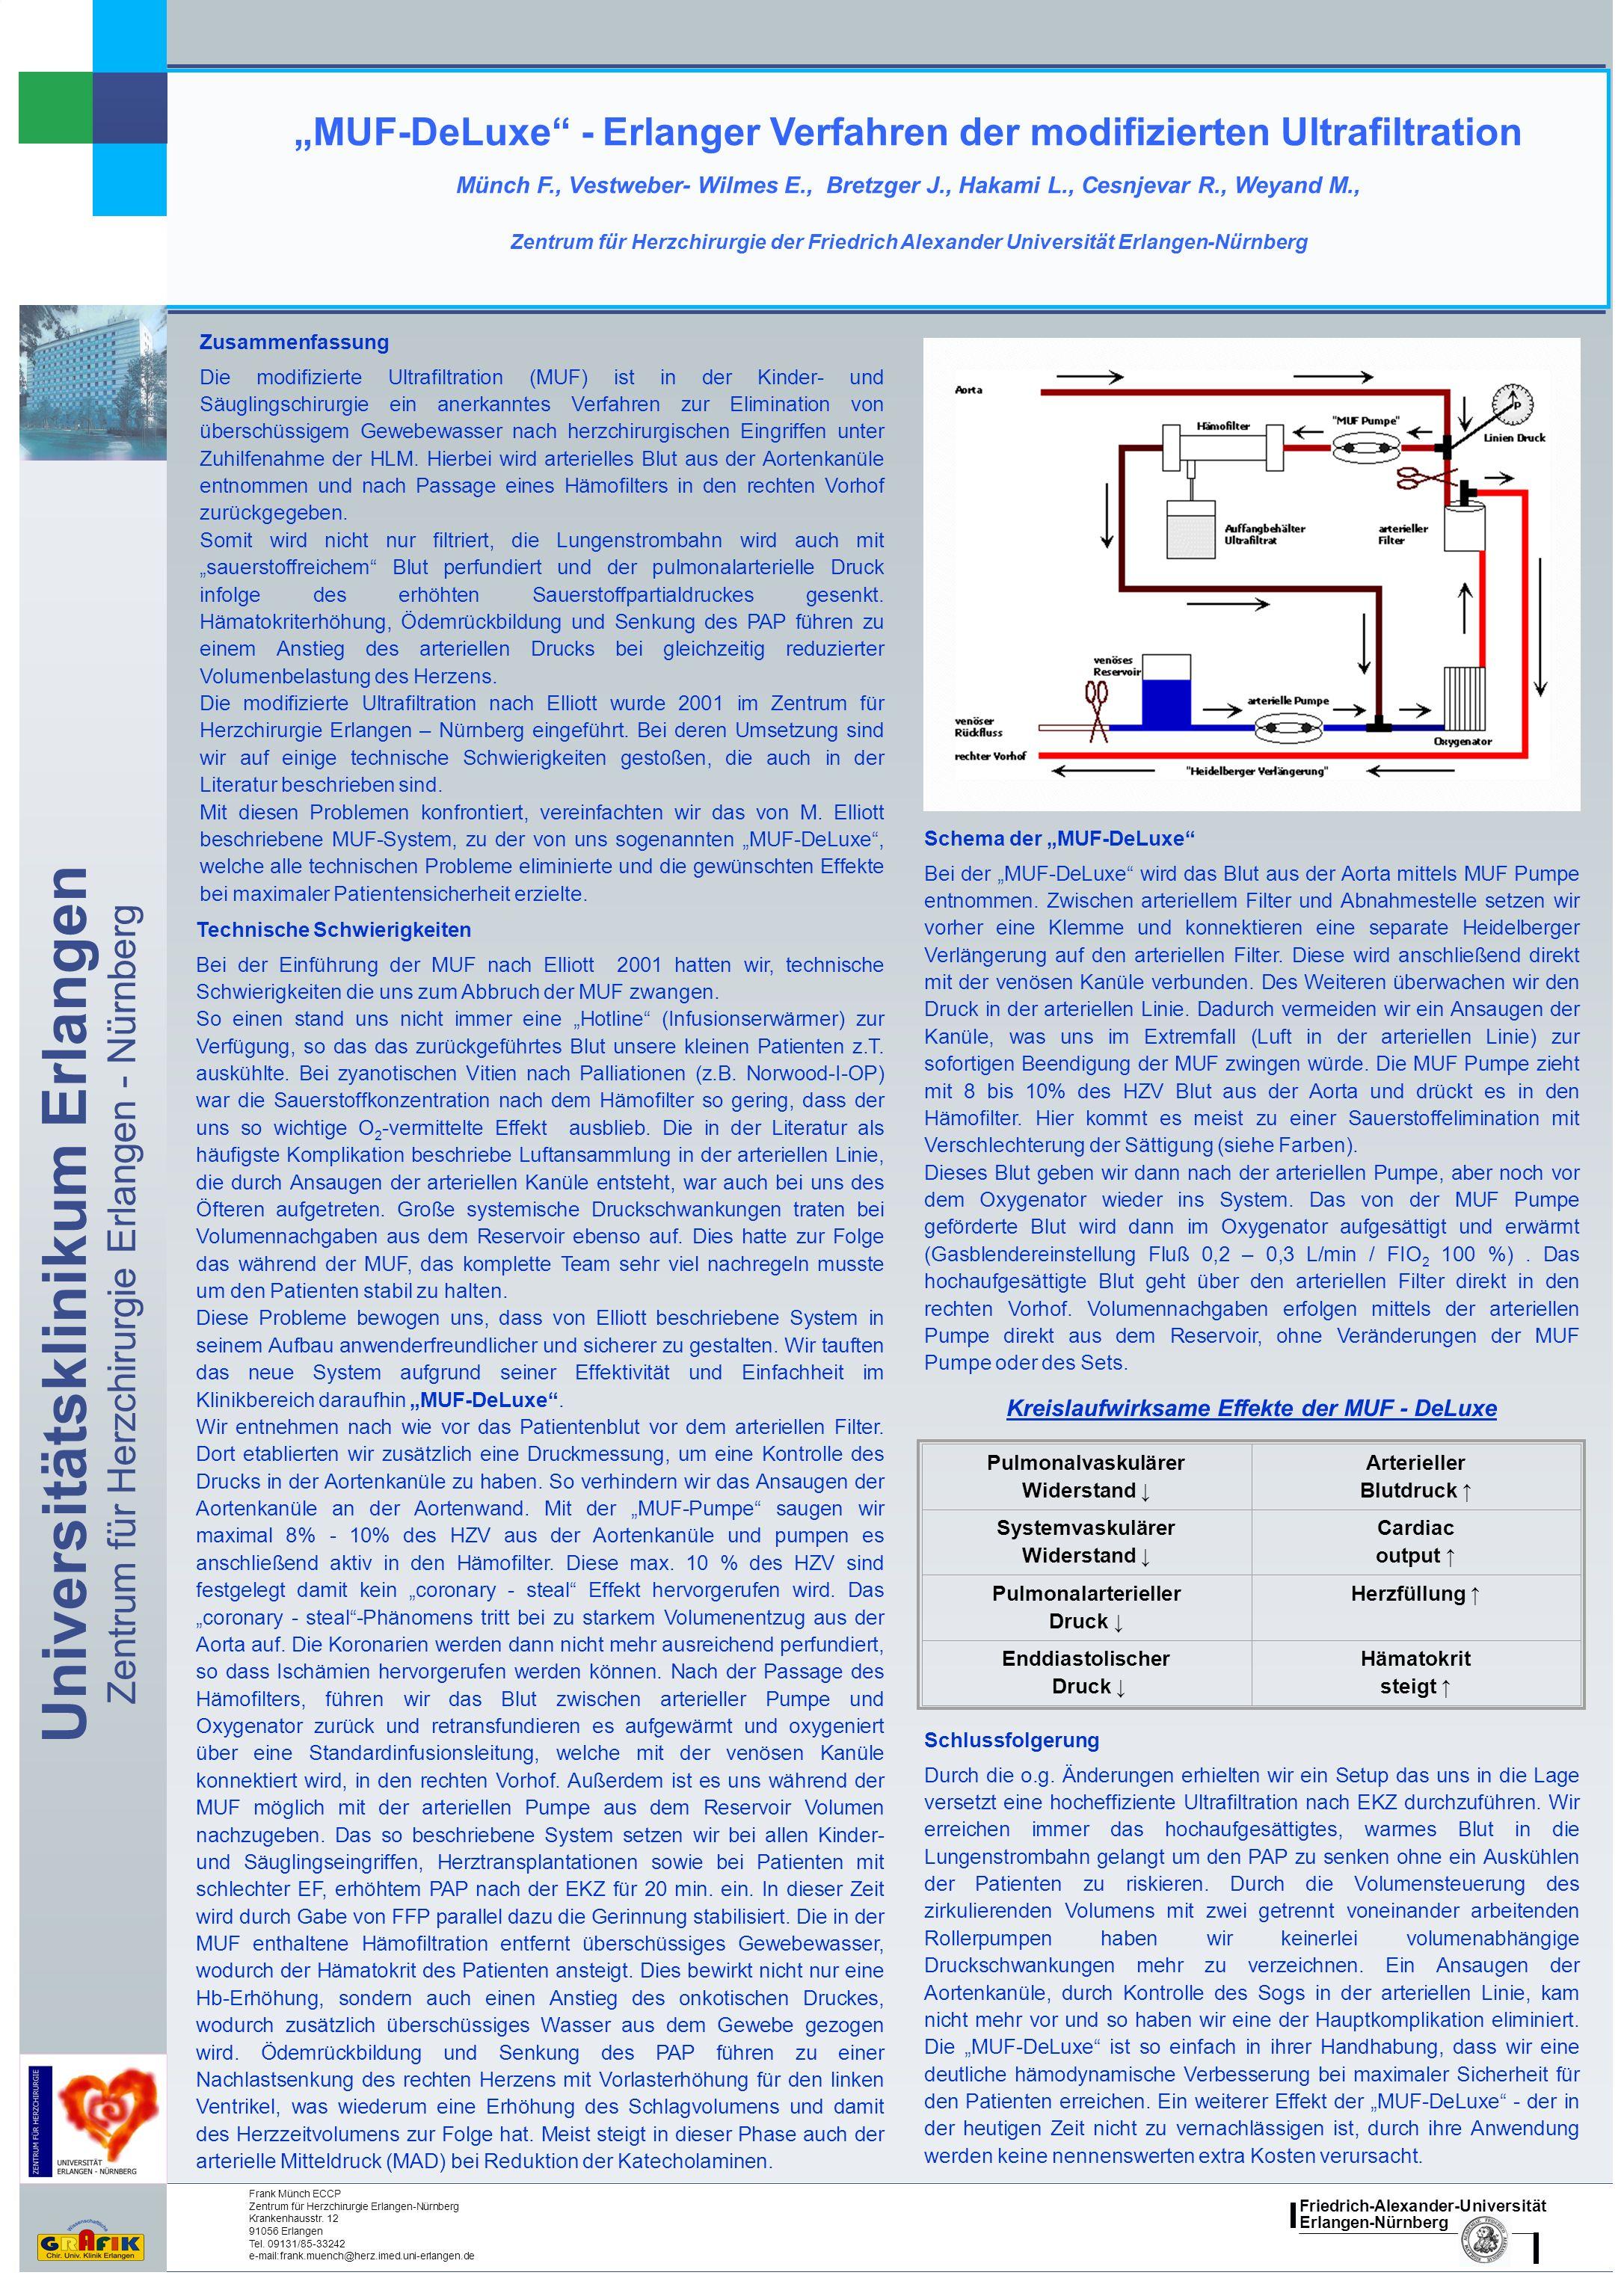 """MUF-DeLuxe - Erlanger Verfahren der modifizierten Ultrafiltration"